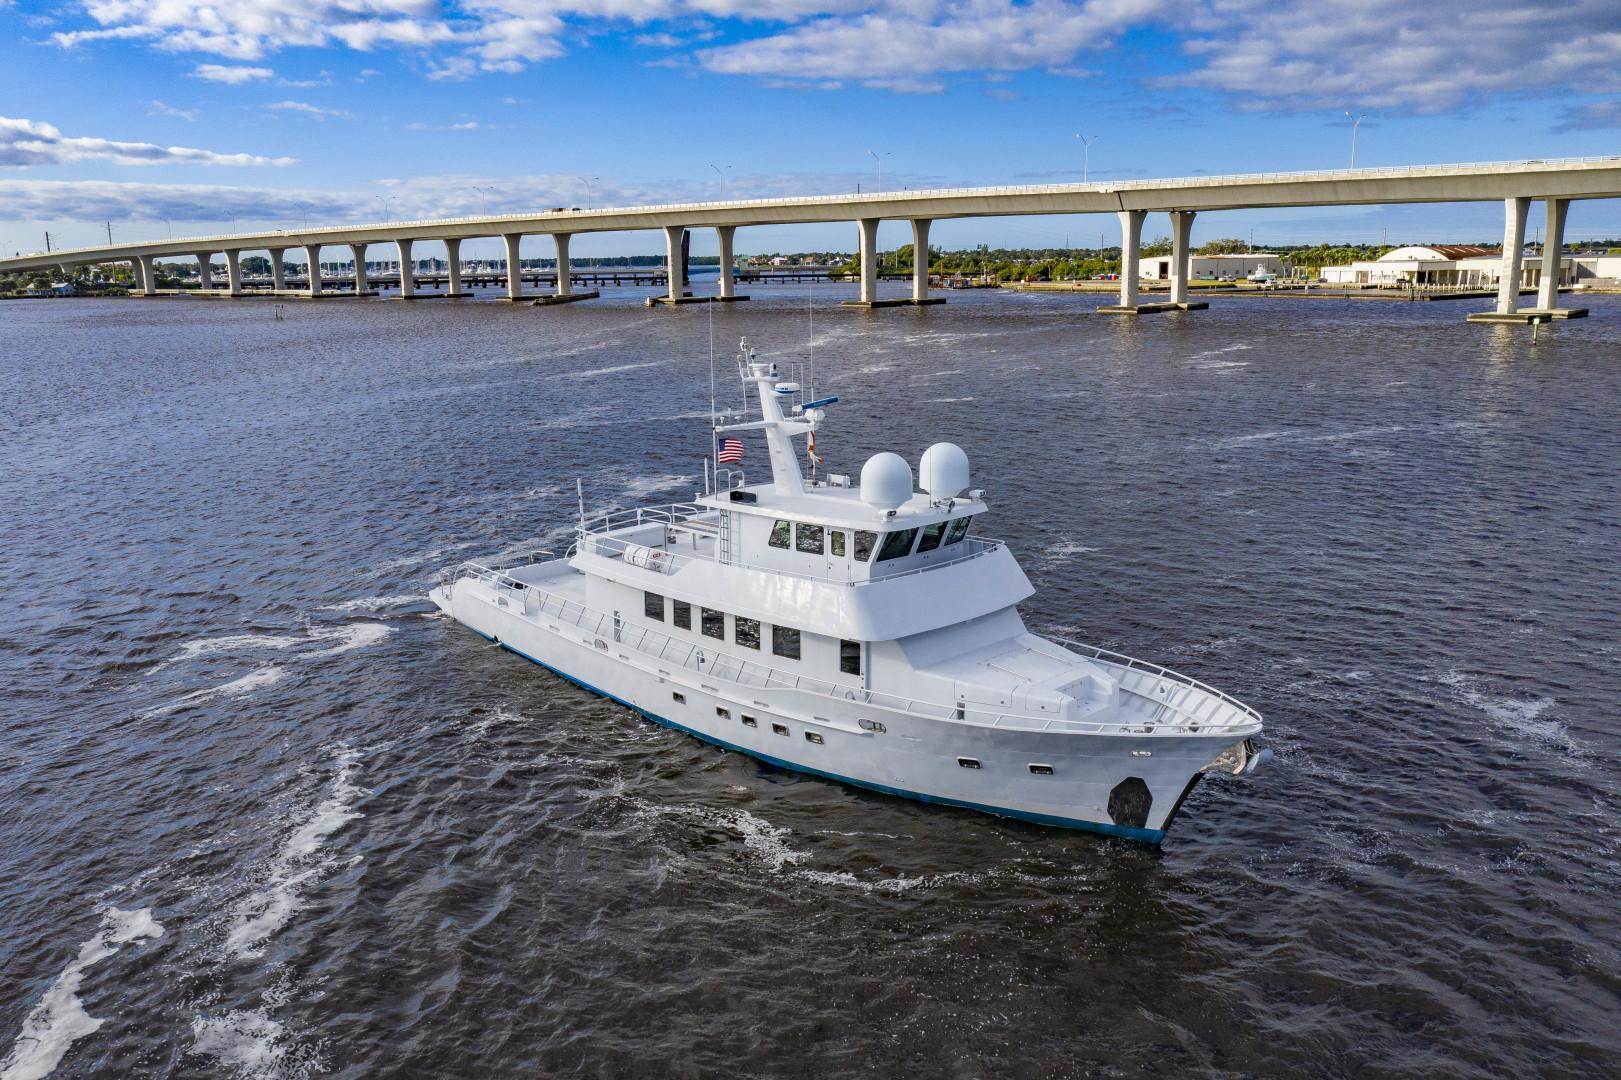 GlassTech-Expedition Yacht 2018-Reset Stuart-Florida-United States-Profile-1568544 | Thumbnail